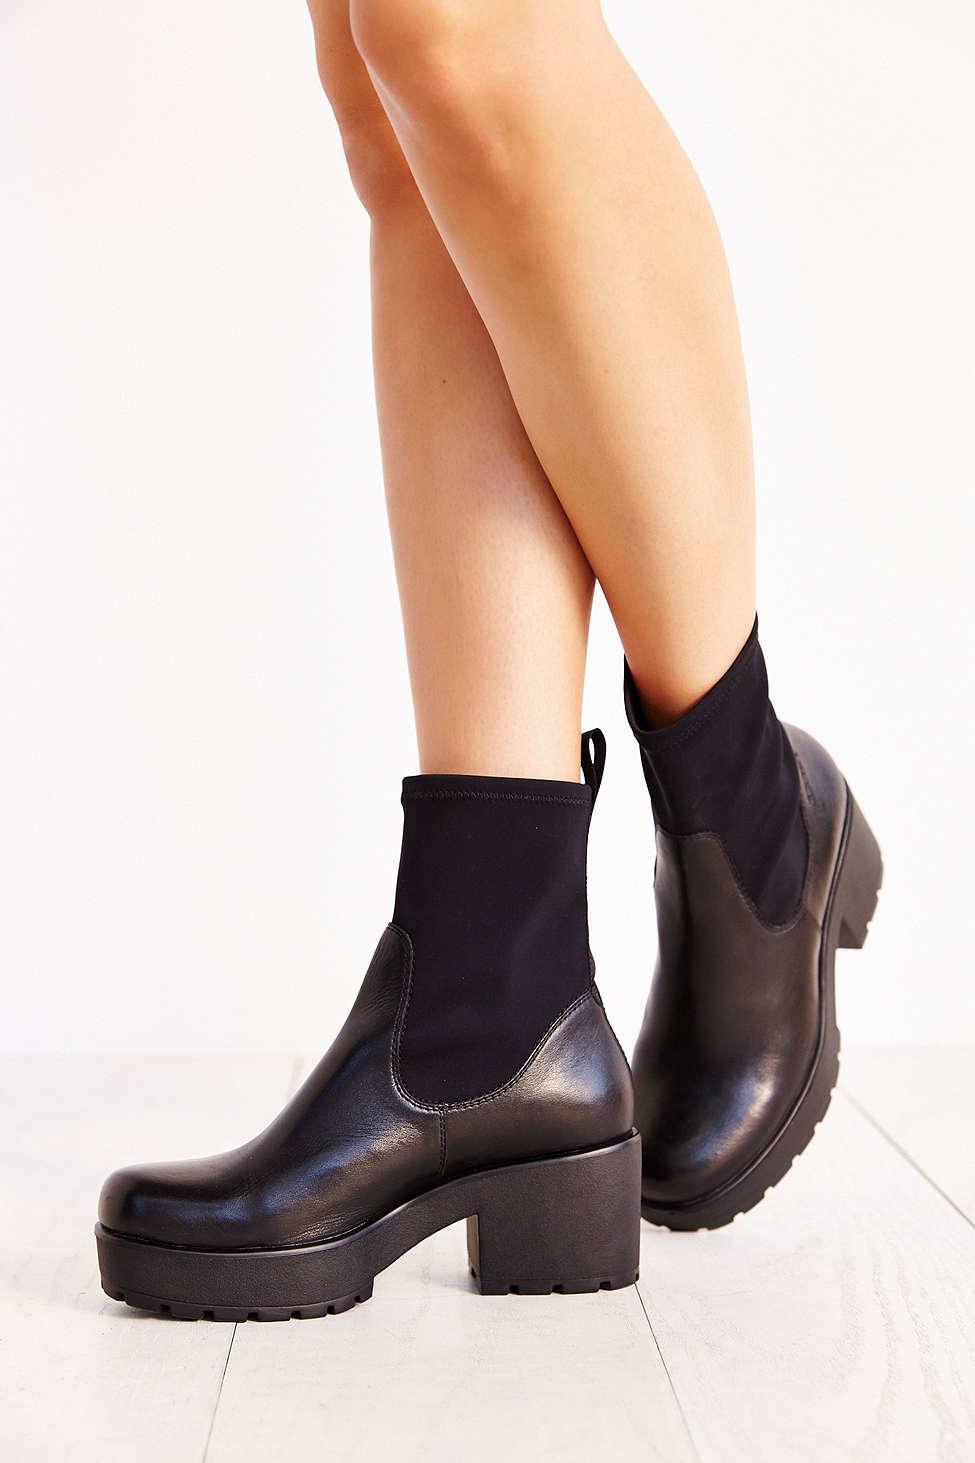 Vagabond Elastic Shoes Black Leather